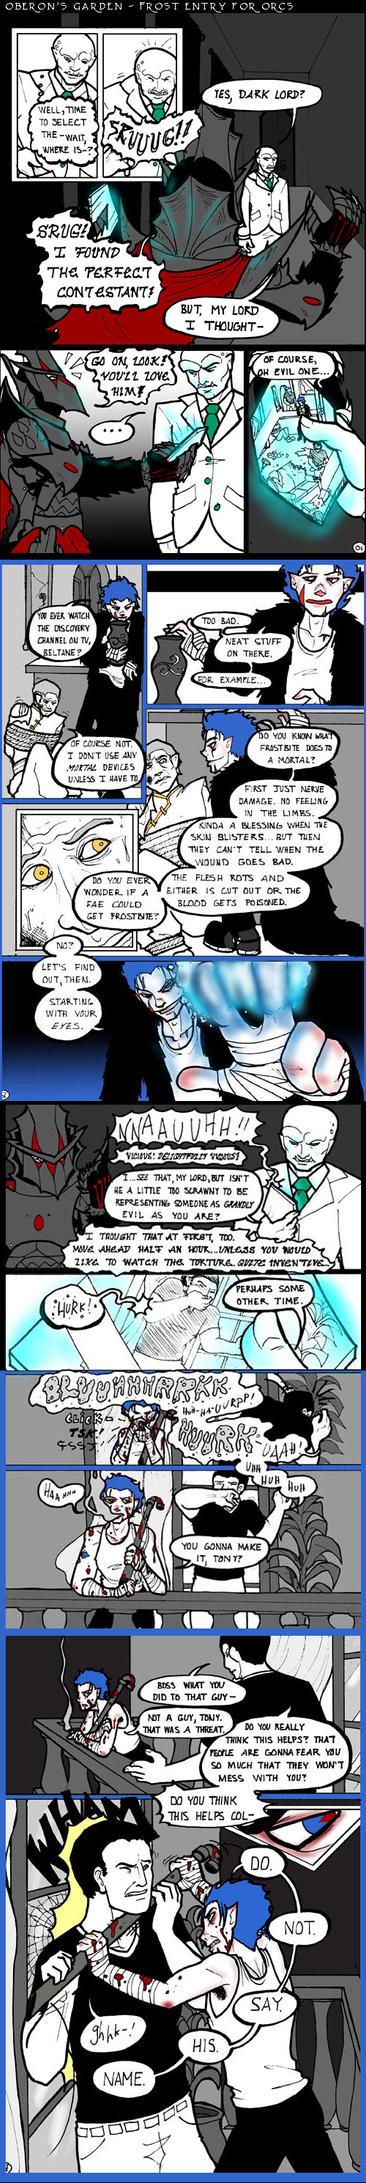 Frost OG Audition pg 1 by RobinRone